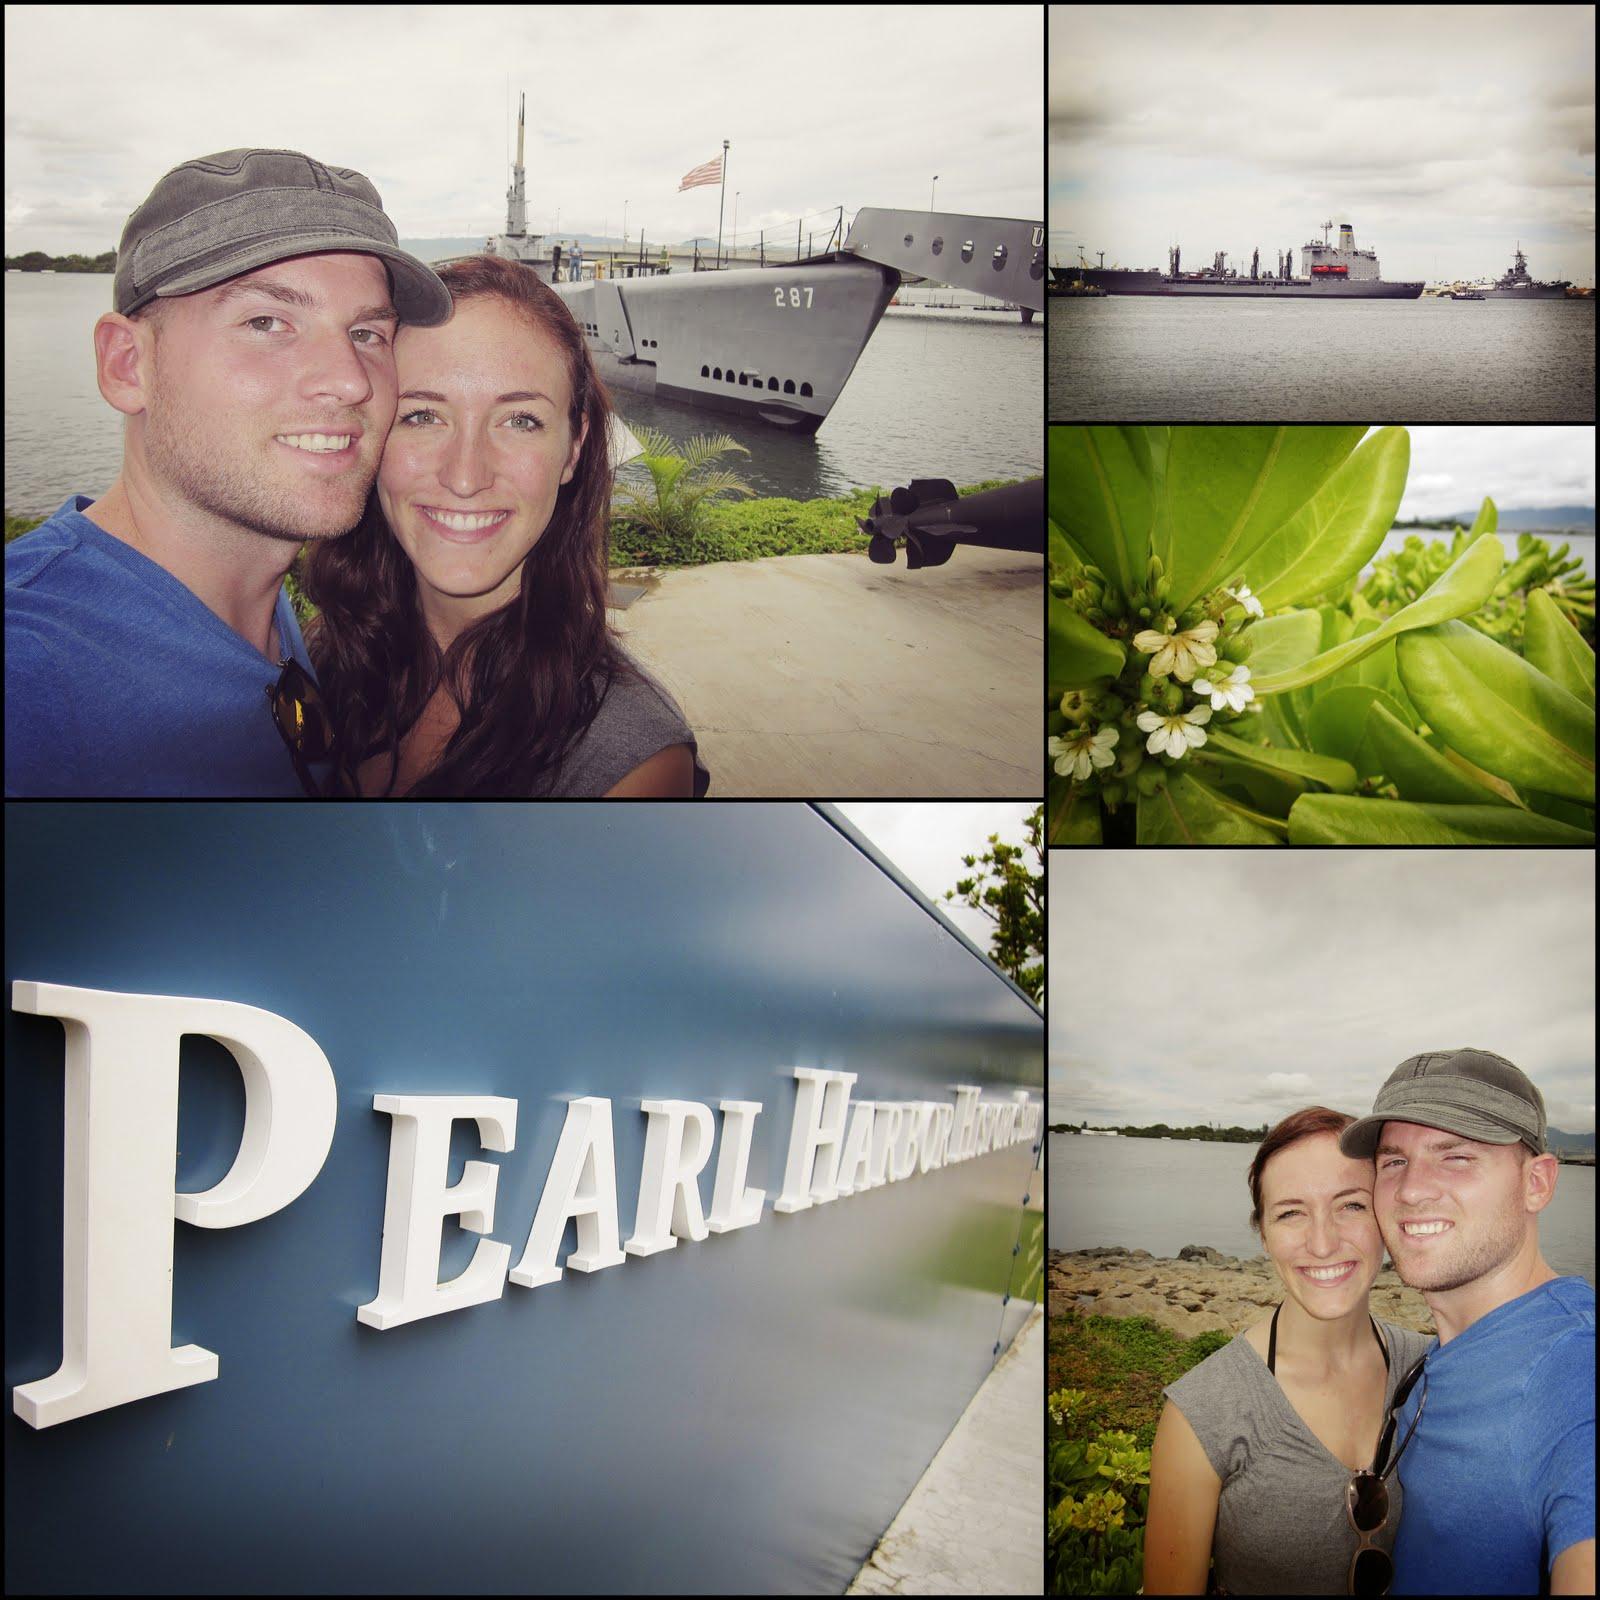 http://2.bp.blogspot.com/-32jvceeFutY/ThDAtowtoZI/AAAAAAAAAzk/5VxfU1qTezo/s1600/Hawaii.jpg